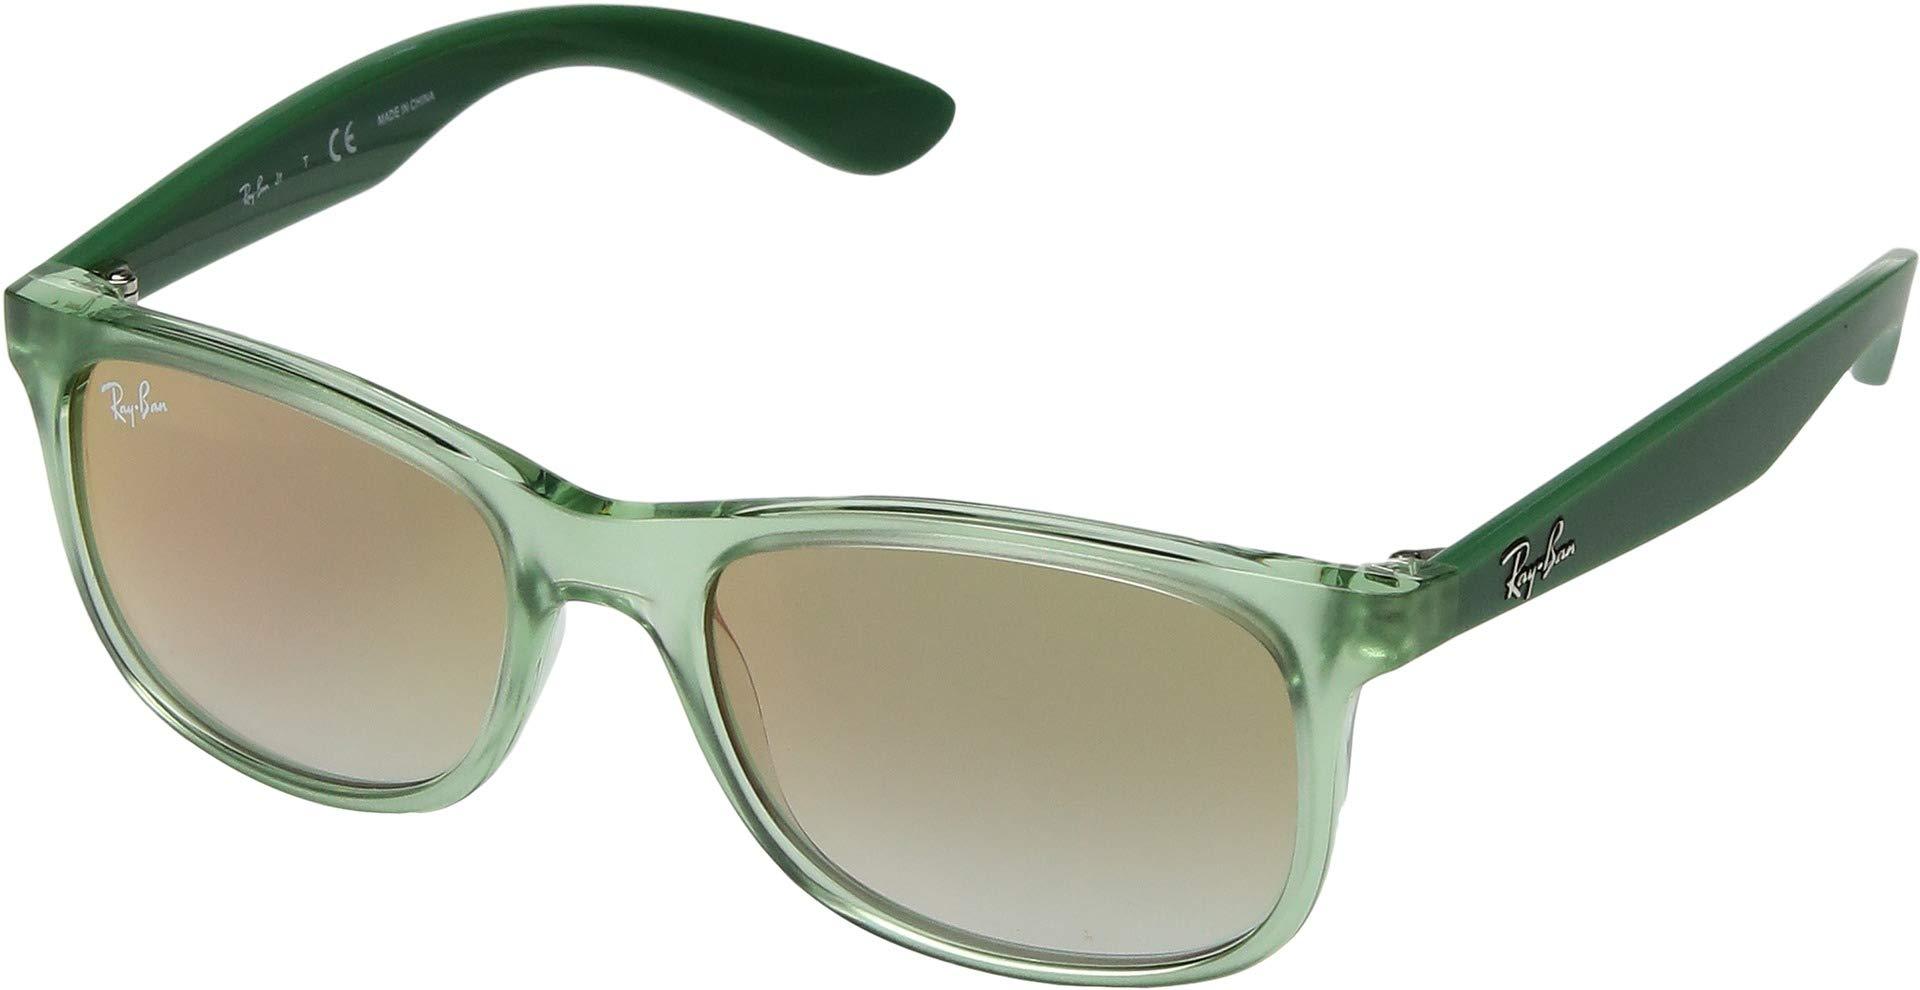 RAY-BAN JUNIOR Kids' RJ9062S Rectangular Kids Sunglasses, Transparent Green/Green Red Gradient Mirror, 48 mm by RAY-BAN JUNIOR